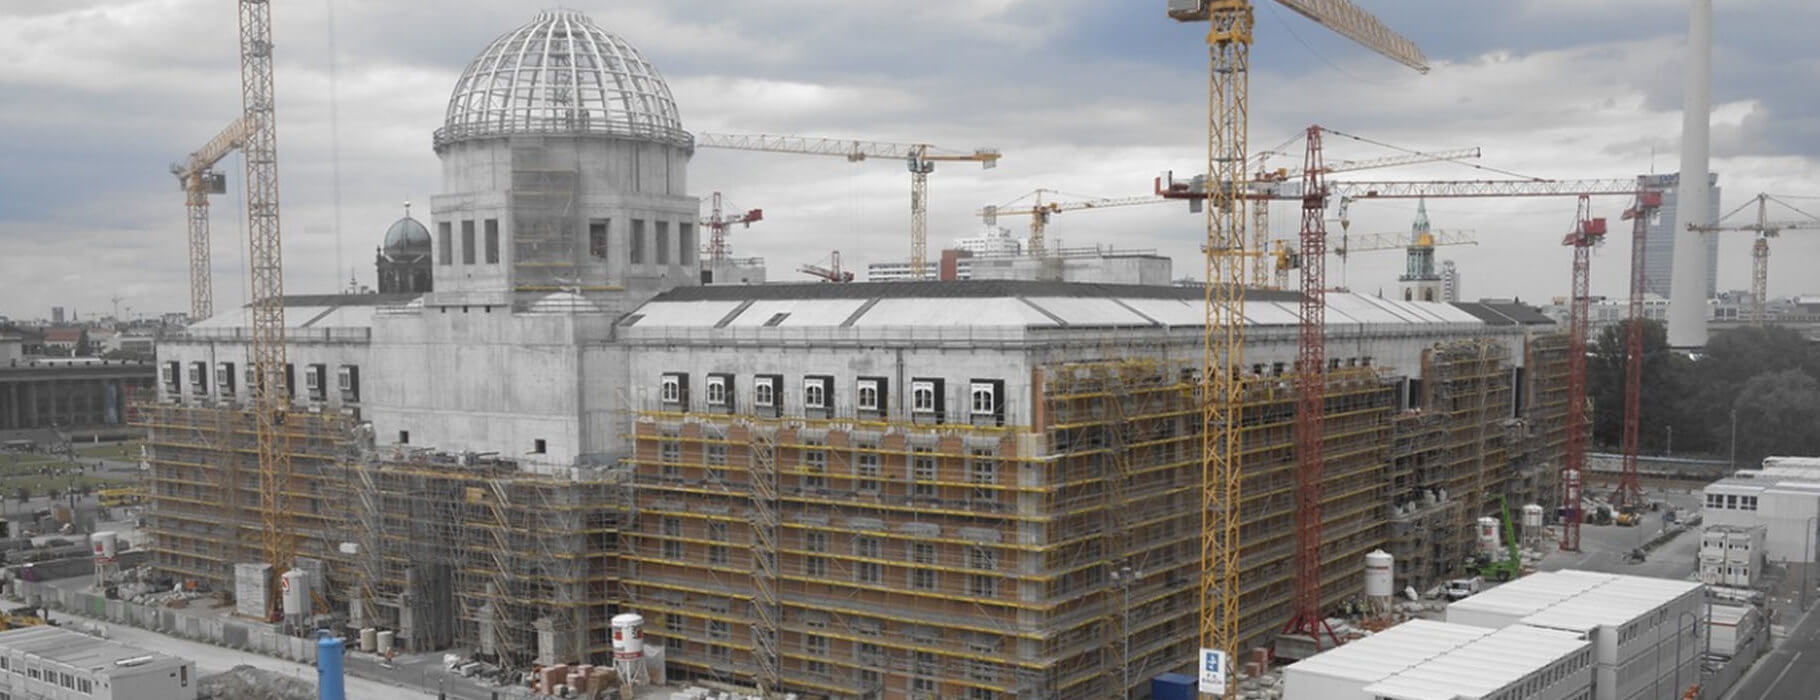 Mplus-SiGeKo-Projekt_HUF_Neubau-Berliner-Schloss_Fassade_West_titelbild